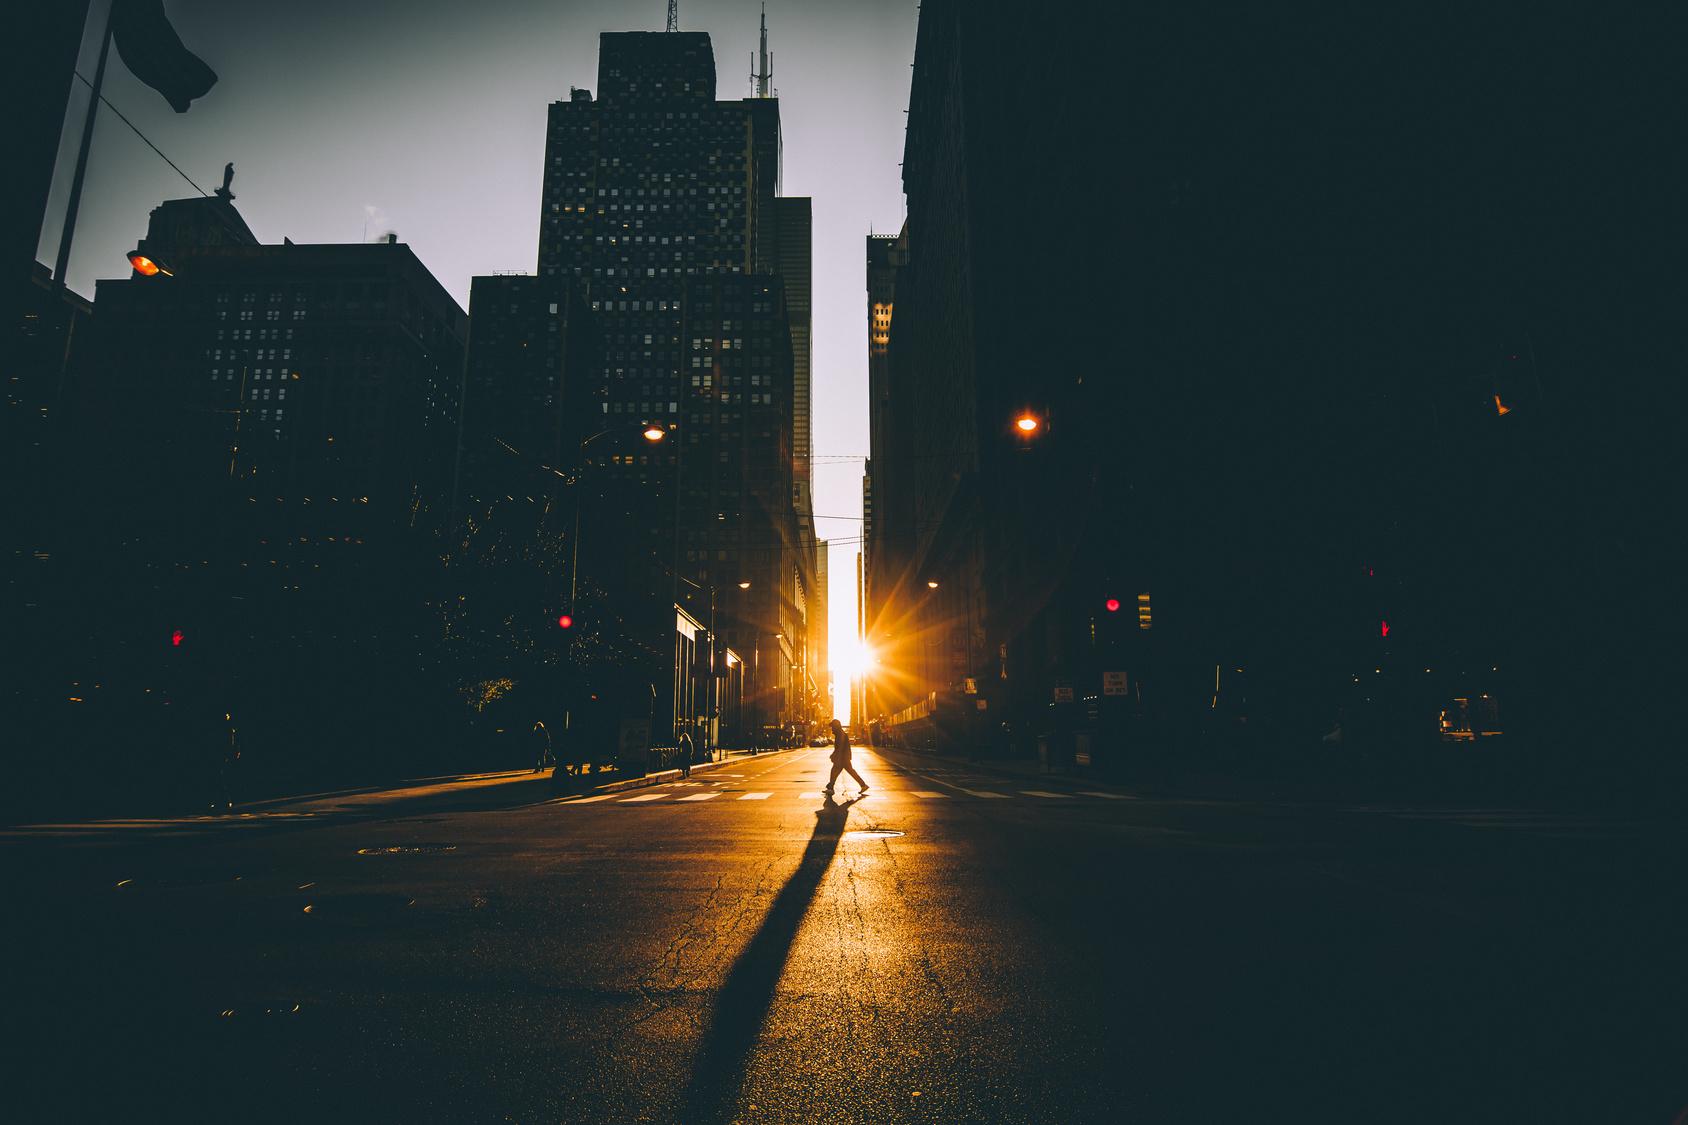 Streets Between Lights Amp Shadows Fubiz Media